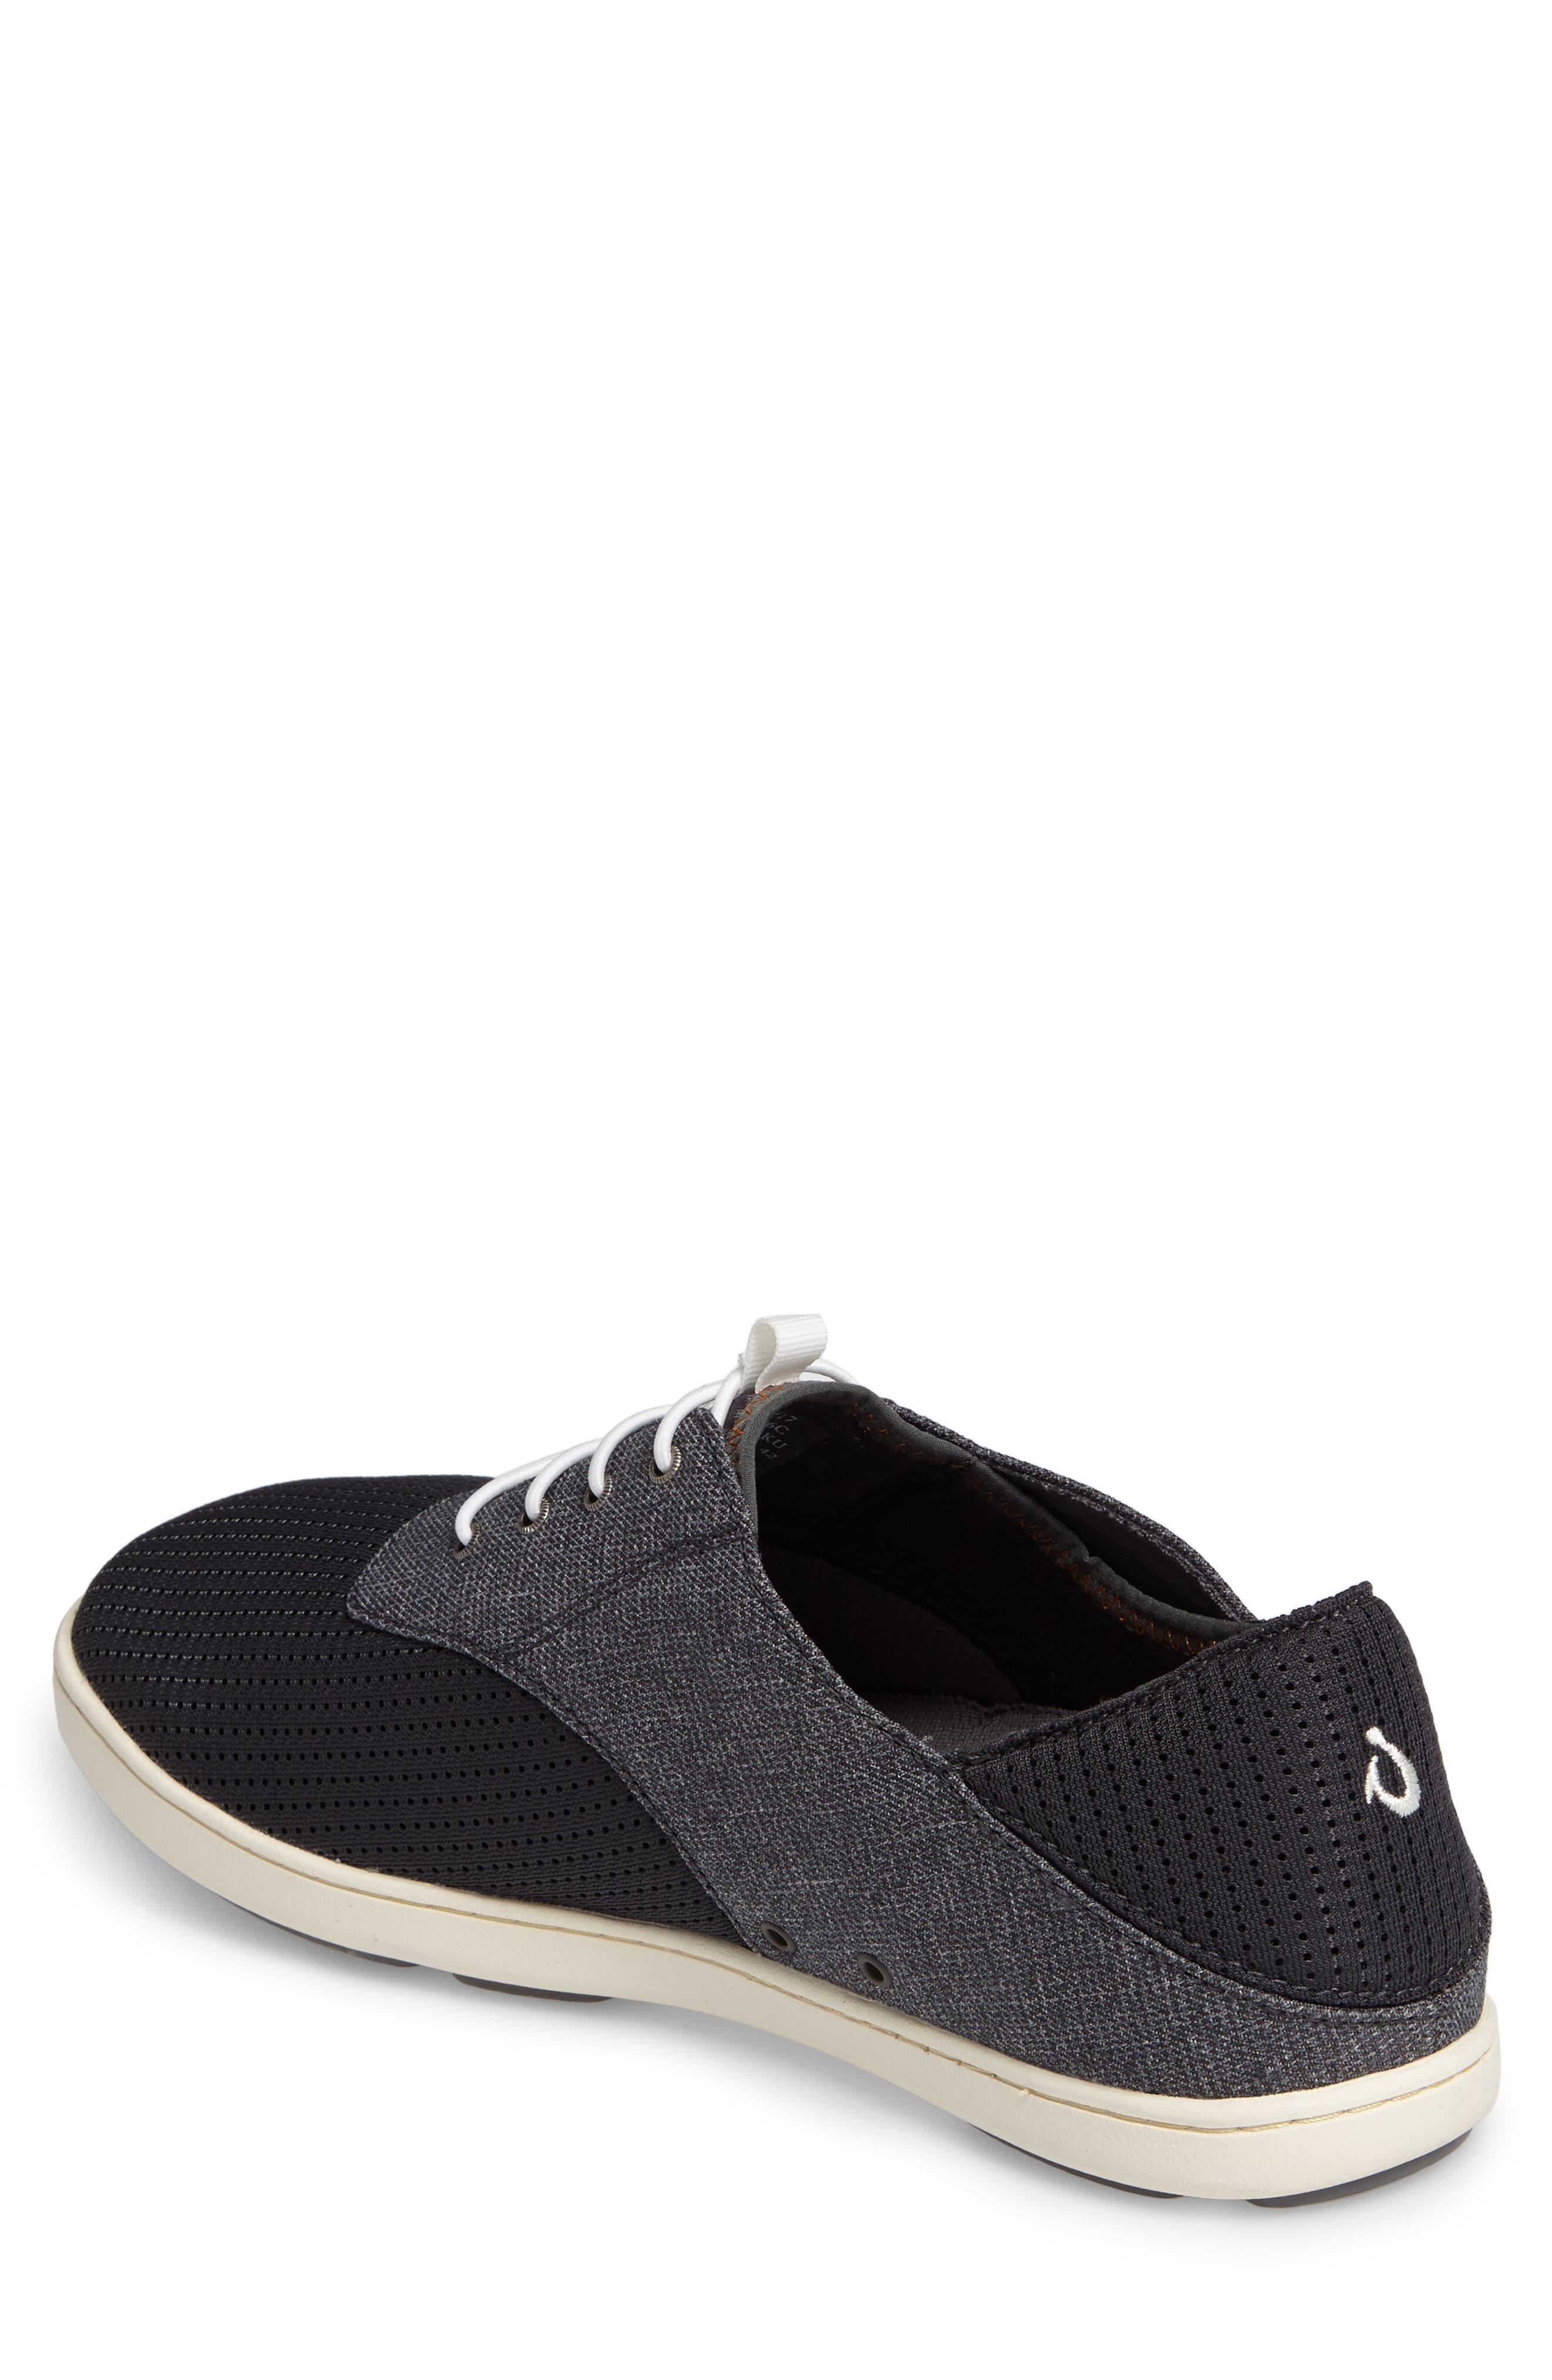 'Nohea Moku' Sneaker,                             Alternate thumbnail 2, color,                             Dark Shadow/ Dark Shadow